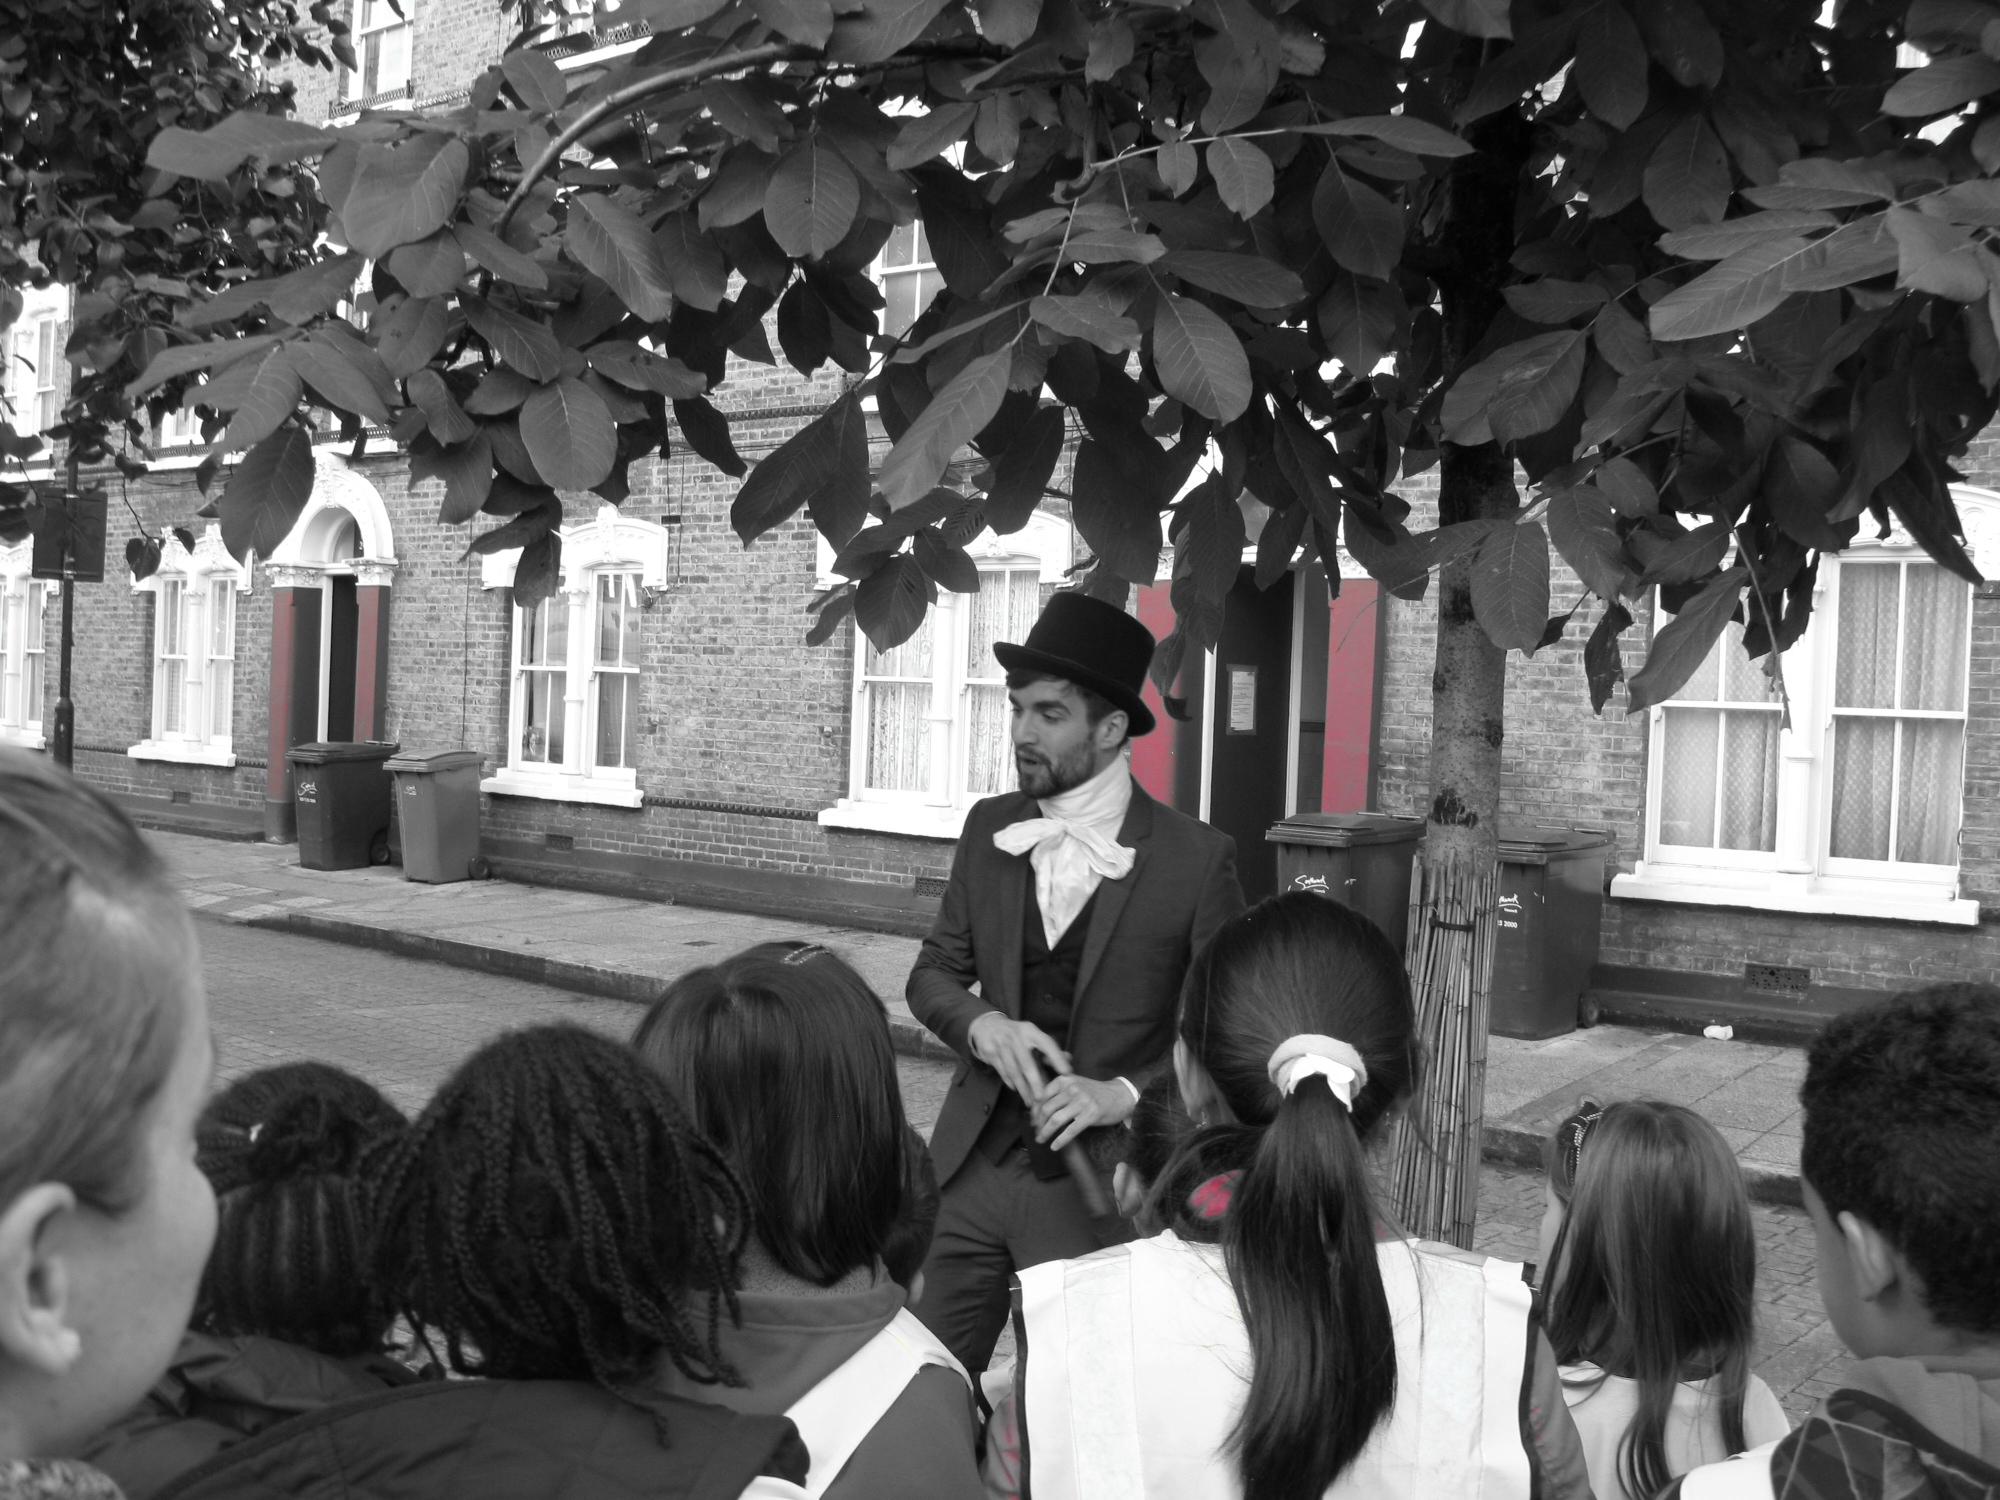 Theatre in Education - Bespoke version of Pullens Promenade Theatre for Year 5 Primary School Children